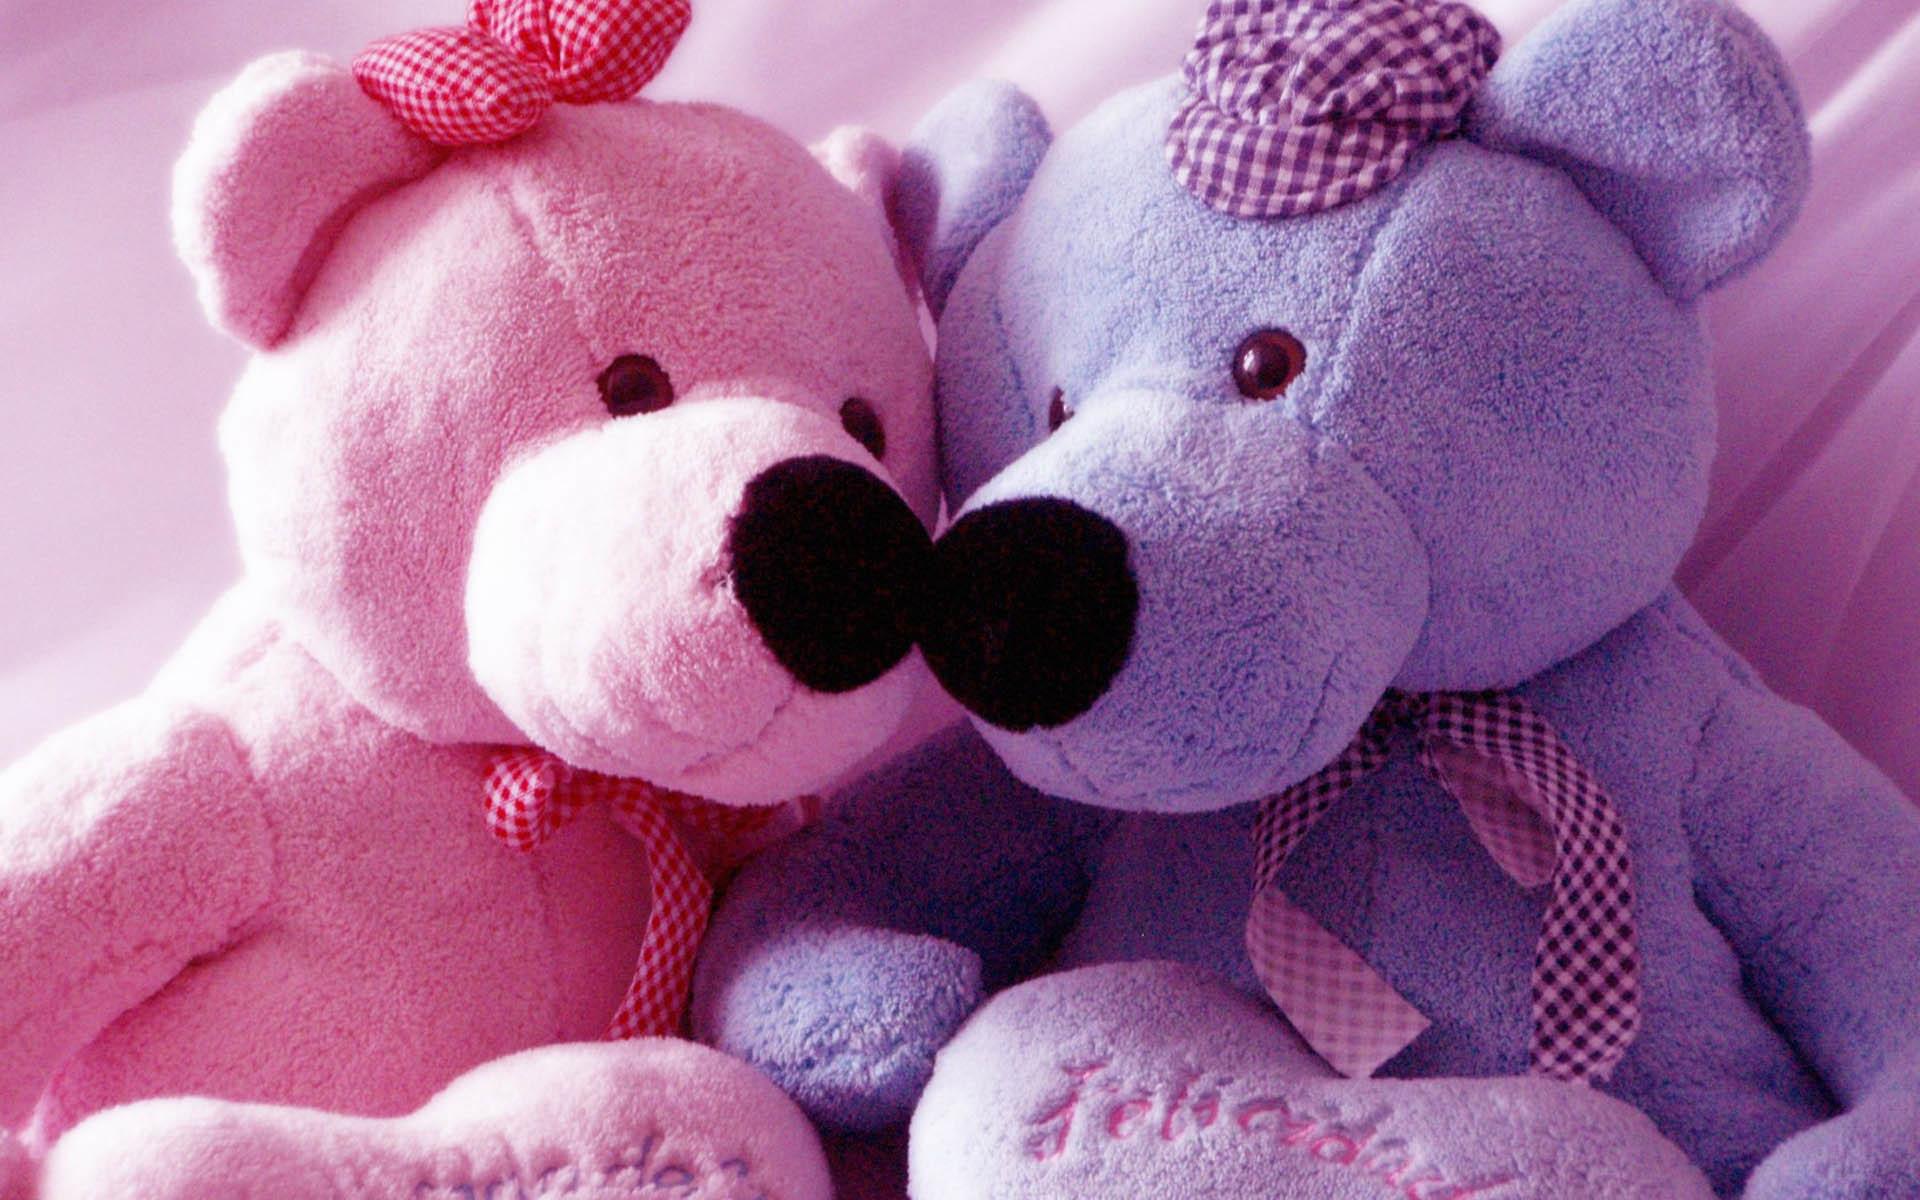 Pink And Blue Teddy Bear Wallpaper Computer 62 #7639 Wallpaper .